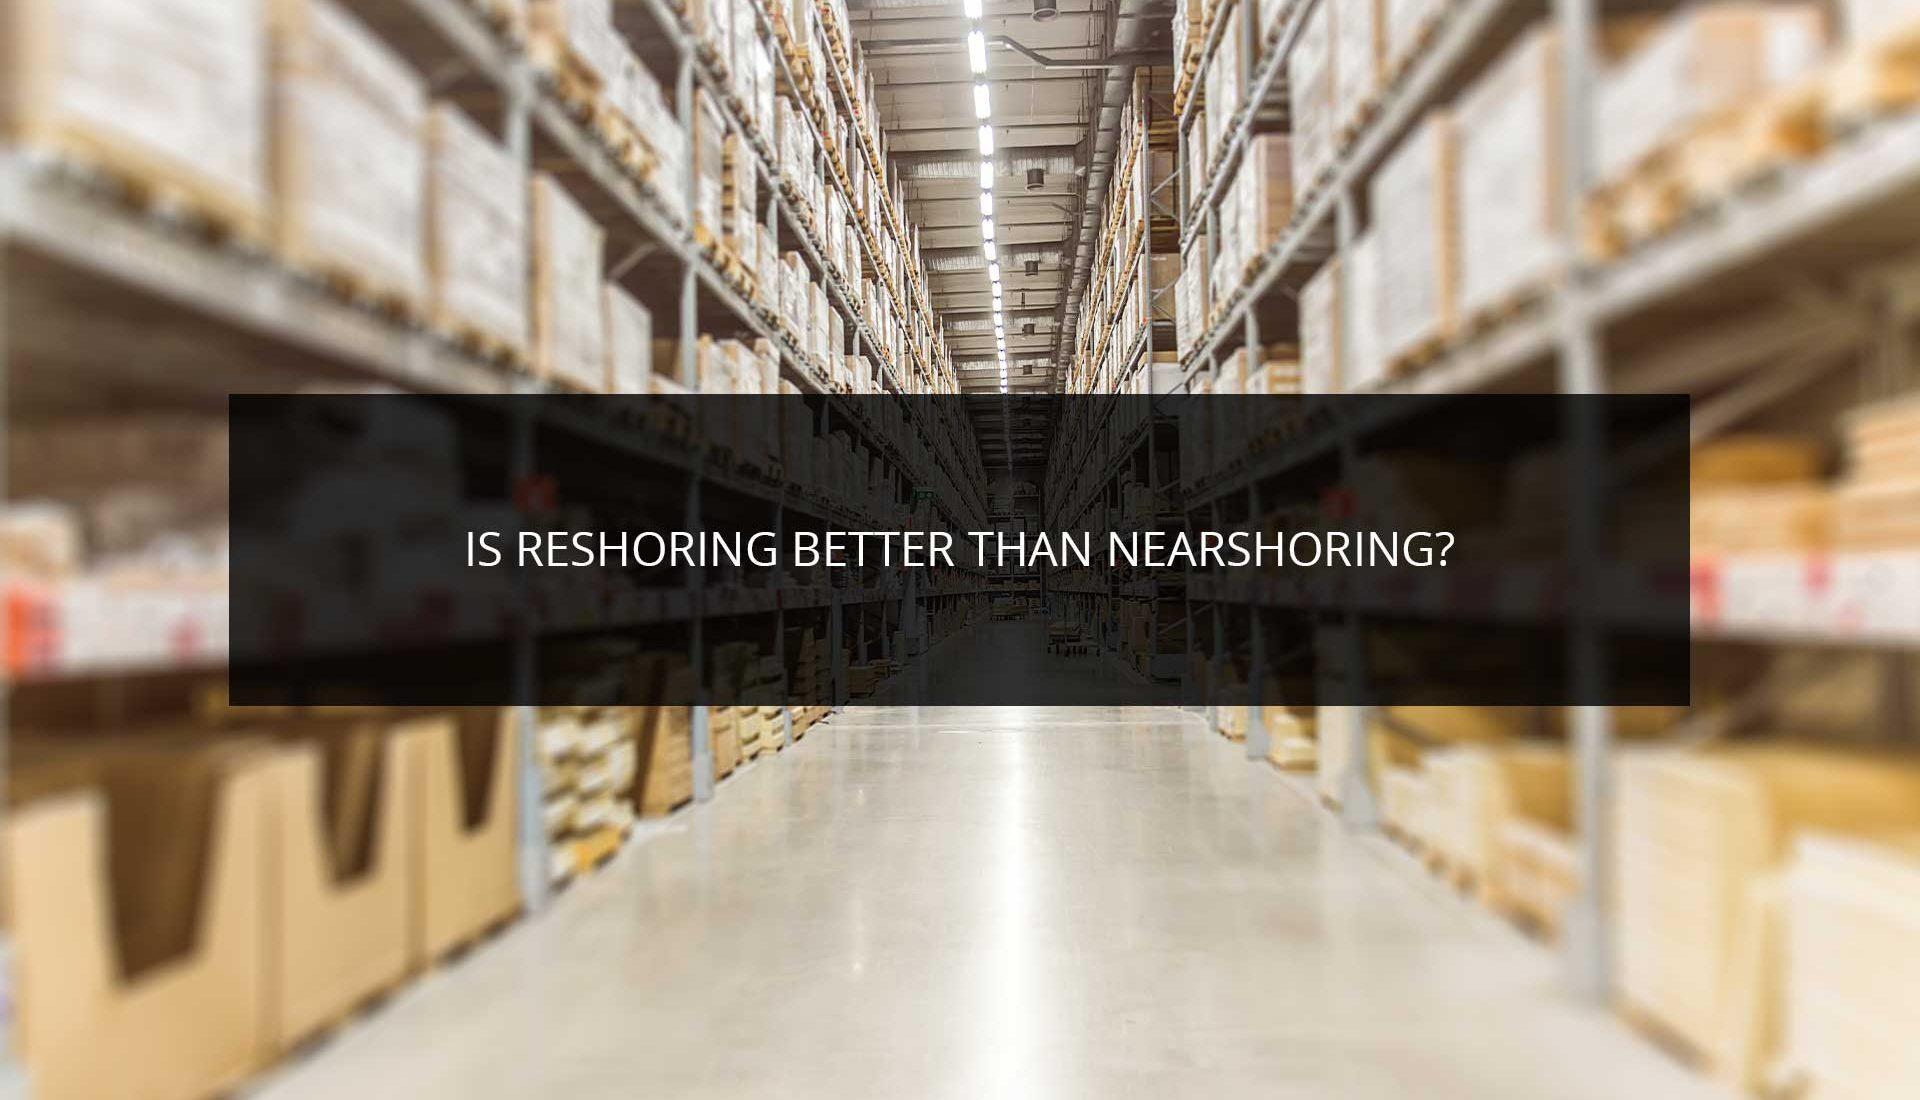 Is Reshoring Better Than Nearshoring?